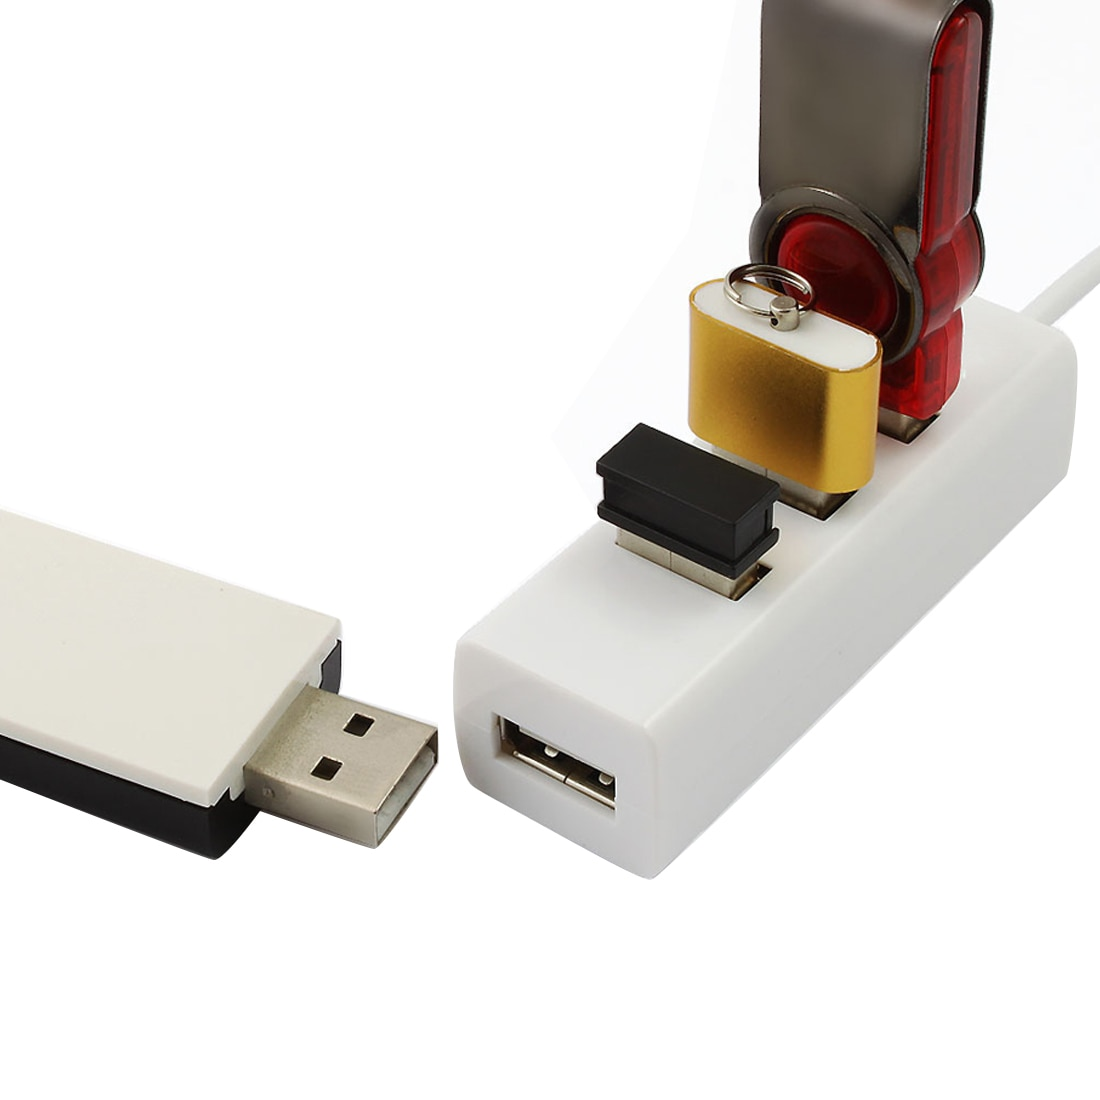 centechia  4 Port USB 2.0 Hub Adapter High-Speed USB Hub SplitterMini For PC Computer For Portable Hard Drives